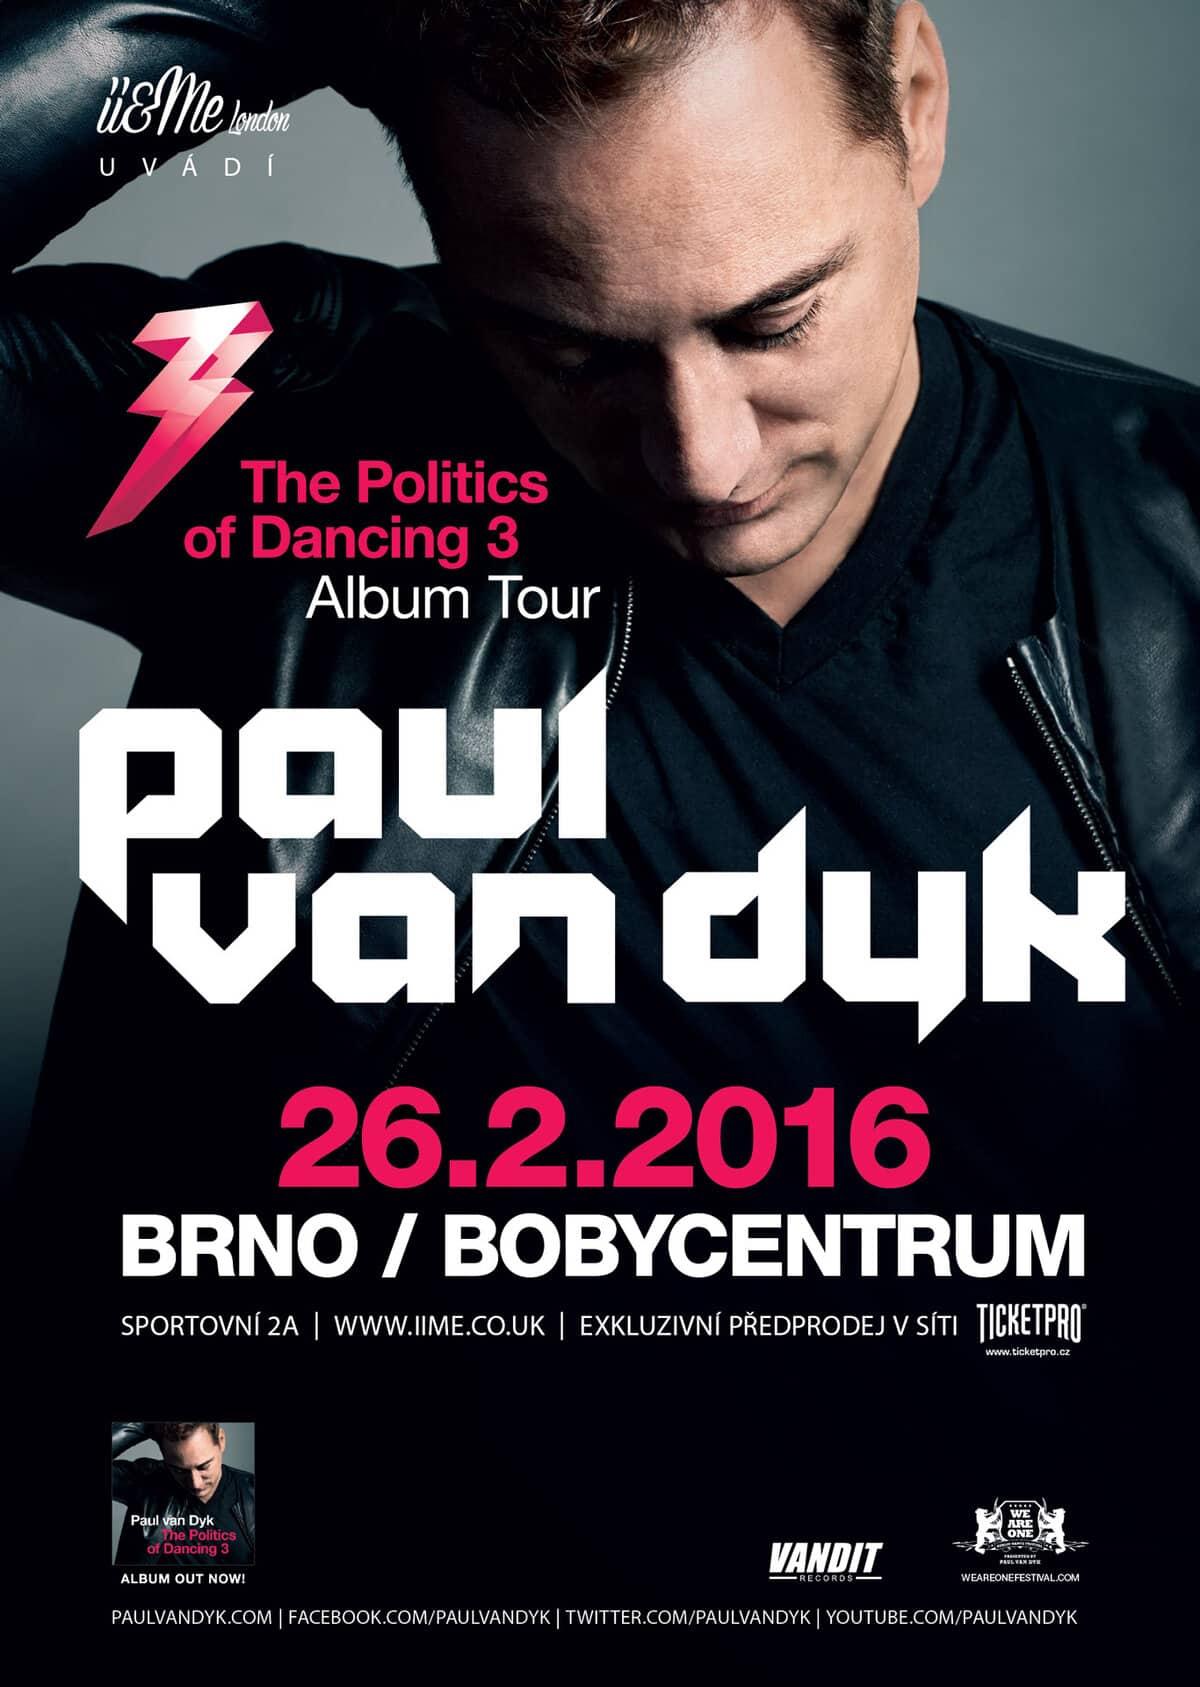 Paul van Dyk s novým albem The Politics Of Dancing 3 míří do Brna!